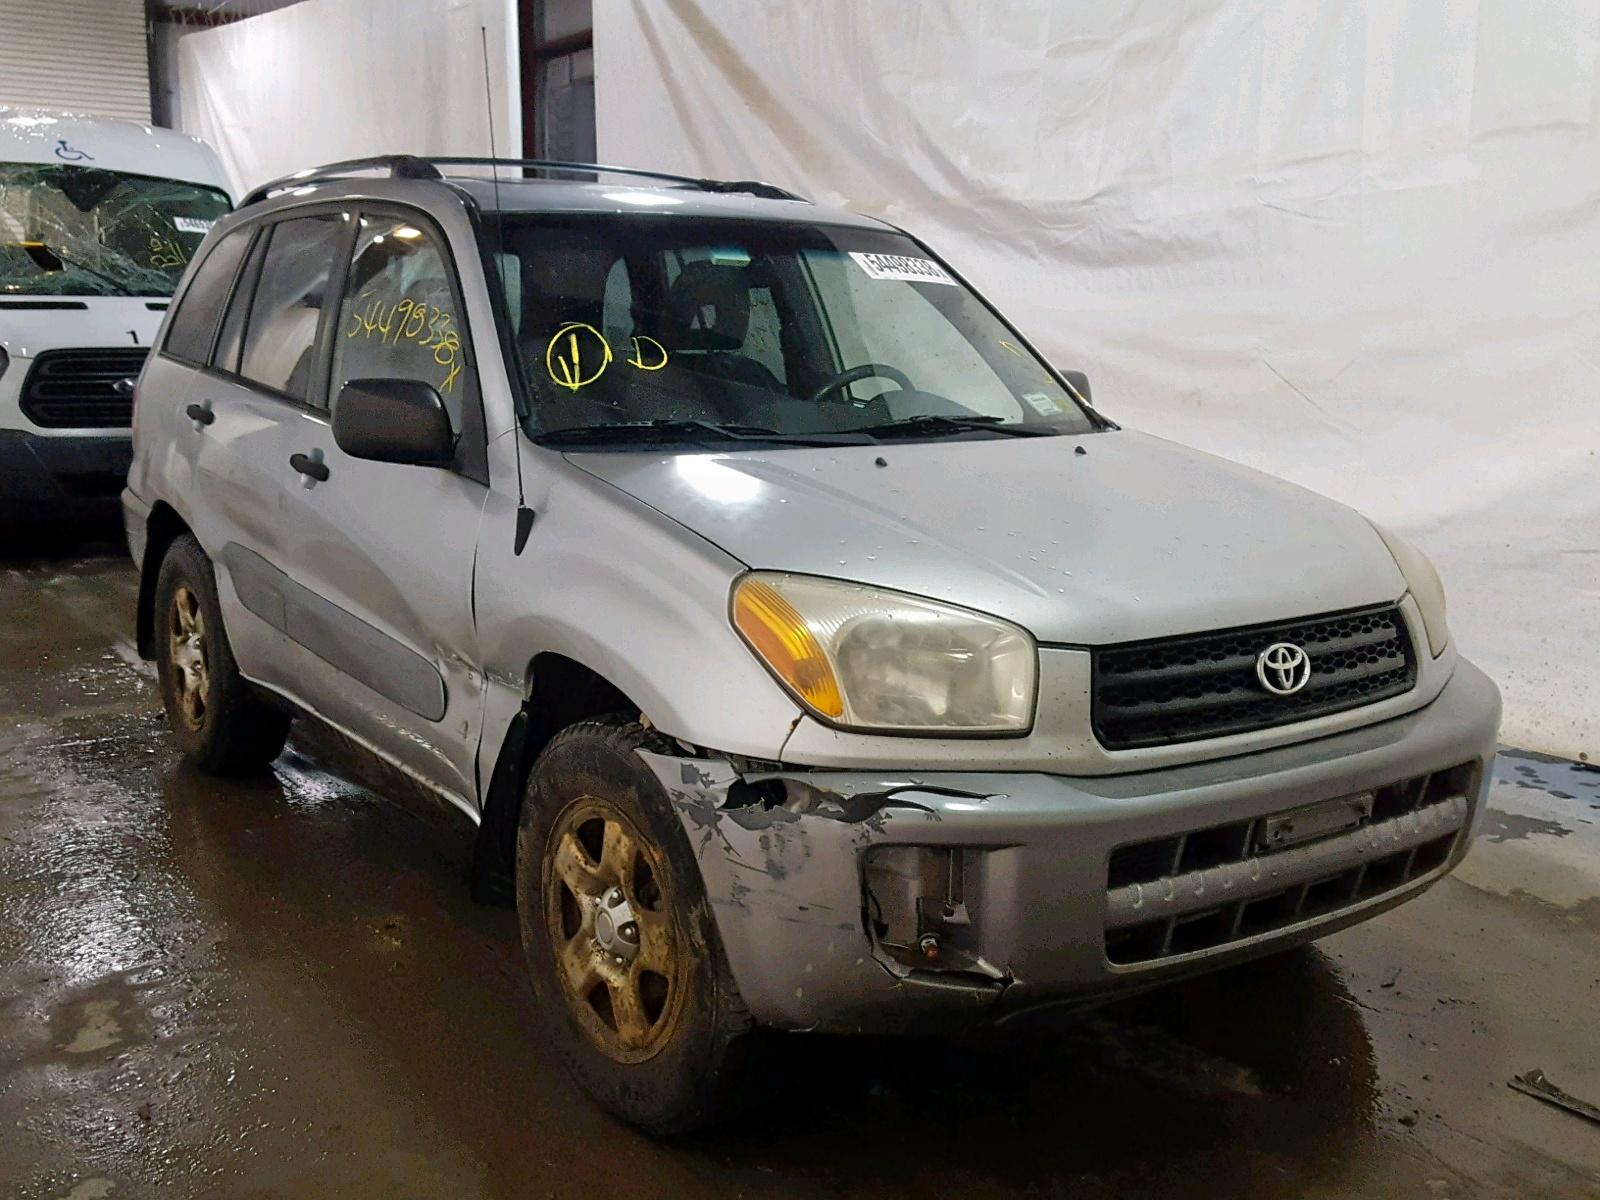 Toyota Rav4 2002 En Venta >> Toyota Rav4 2002 De Venta En Copart Central Square Ny Lot 54498338